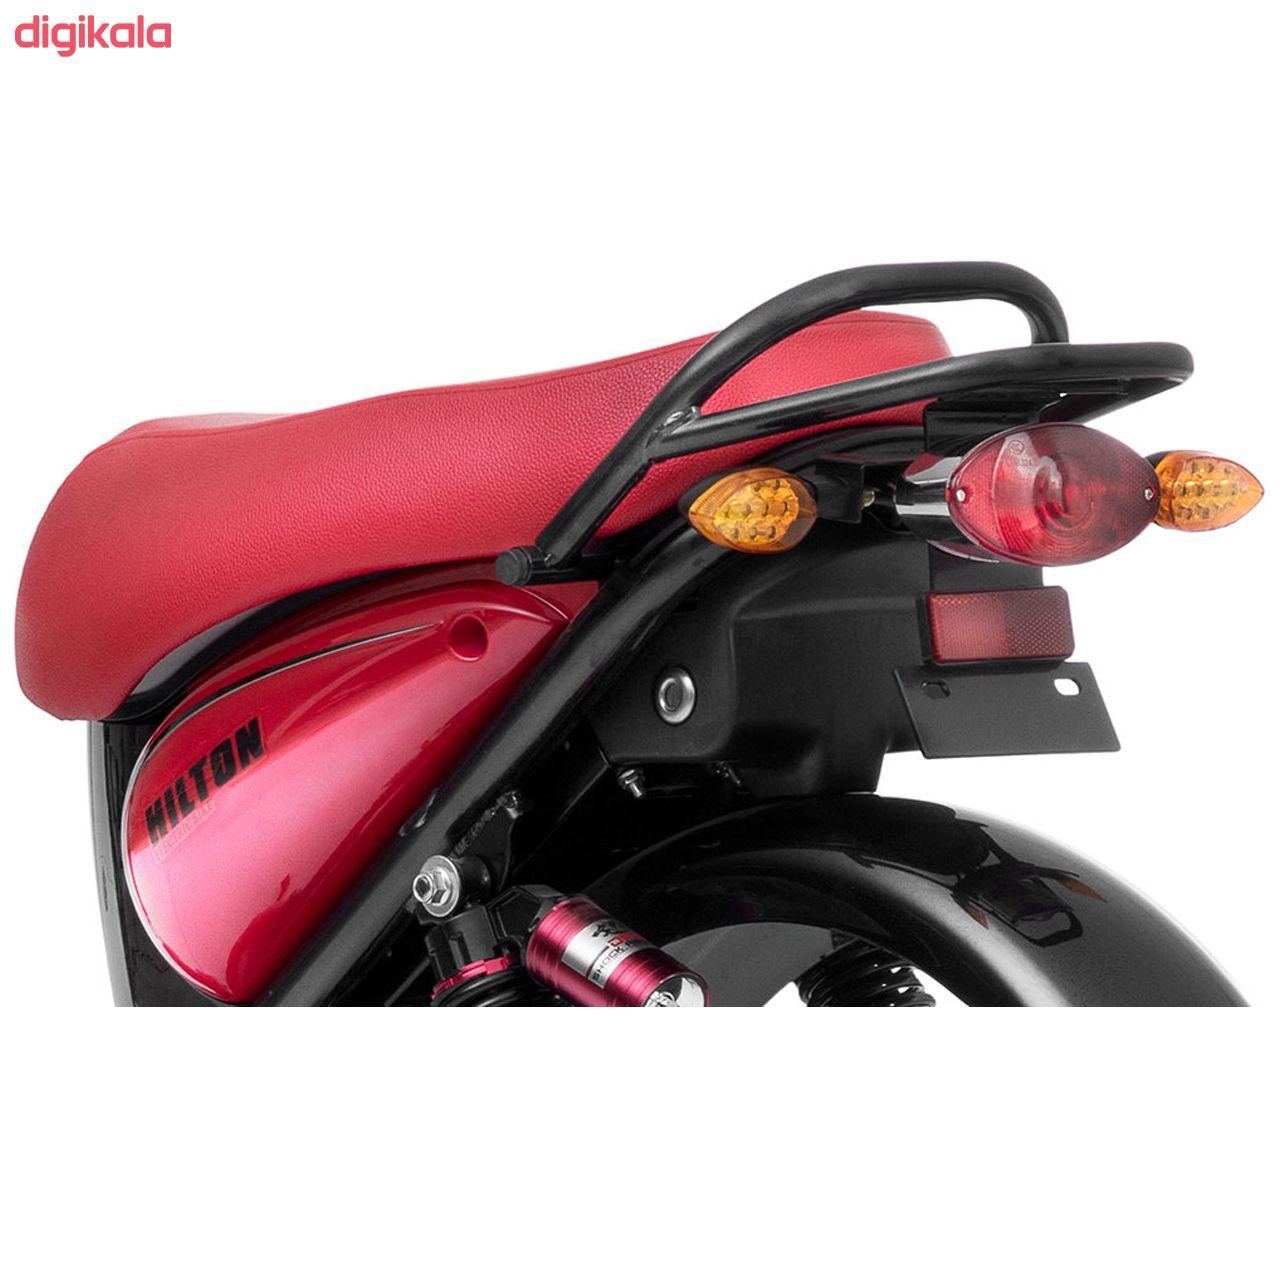 موتورسیکلت  گلکسی مدل 1500ETسی سی سال 1399 main 1 5